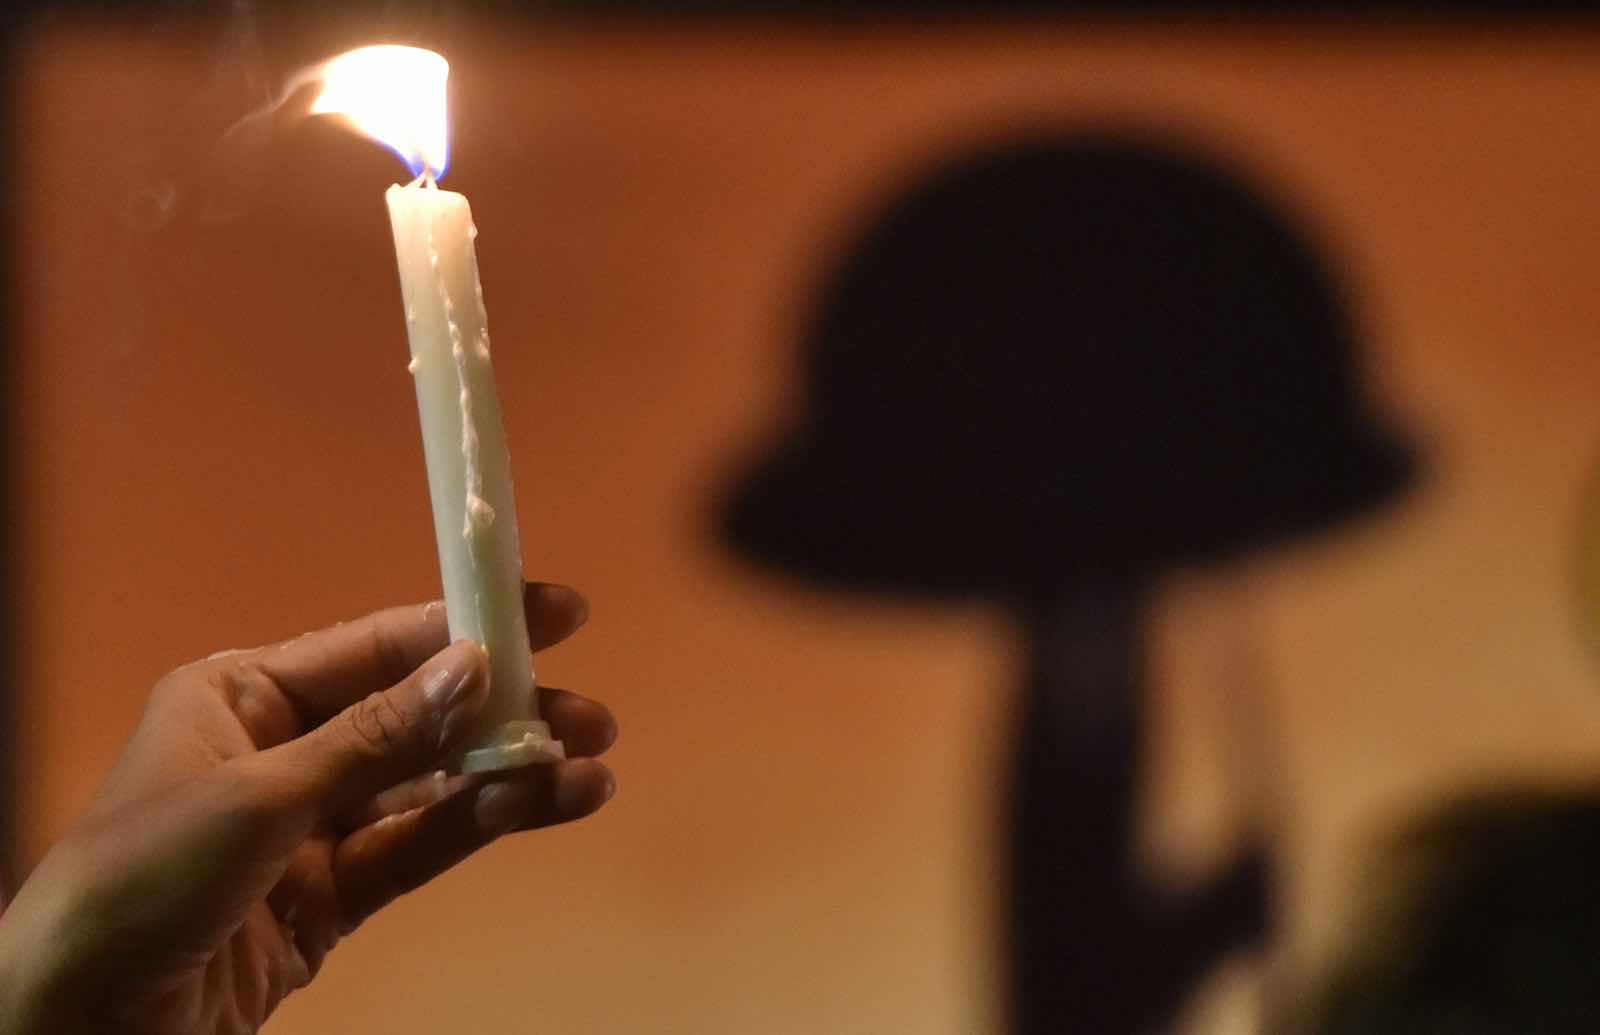 Tributes to the slain following the 14 February attack (Photo: Mohd Zakir via Getty)